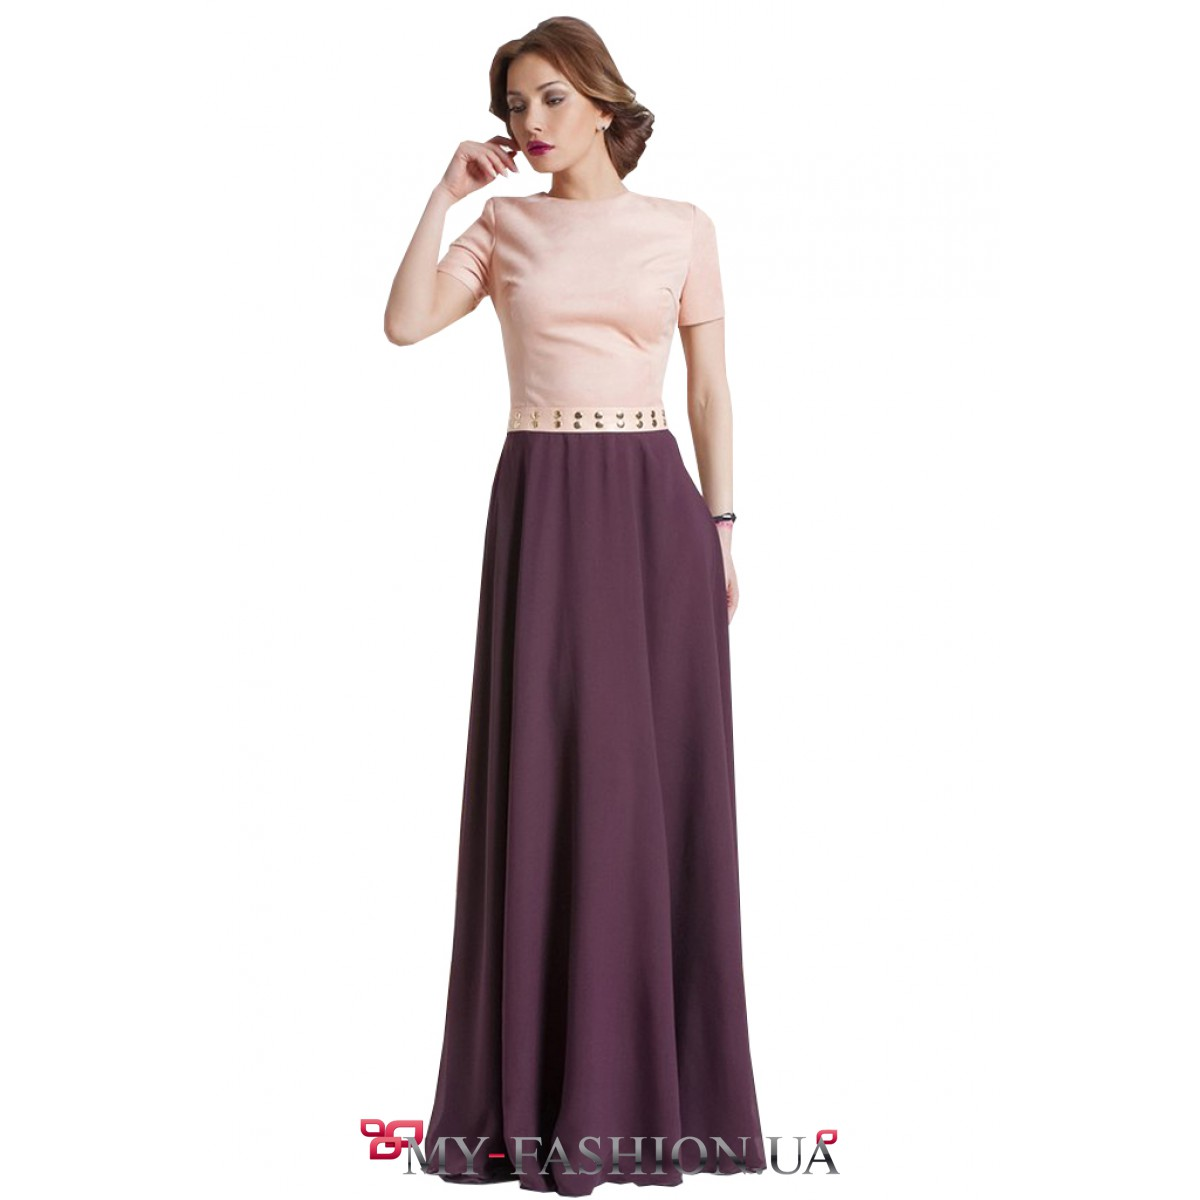 Вечерние платья юбки с доставкой